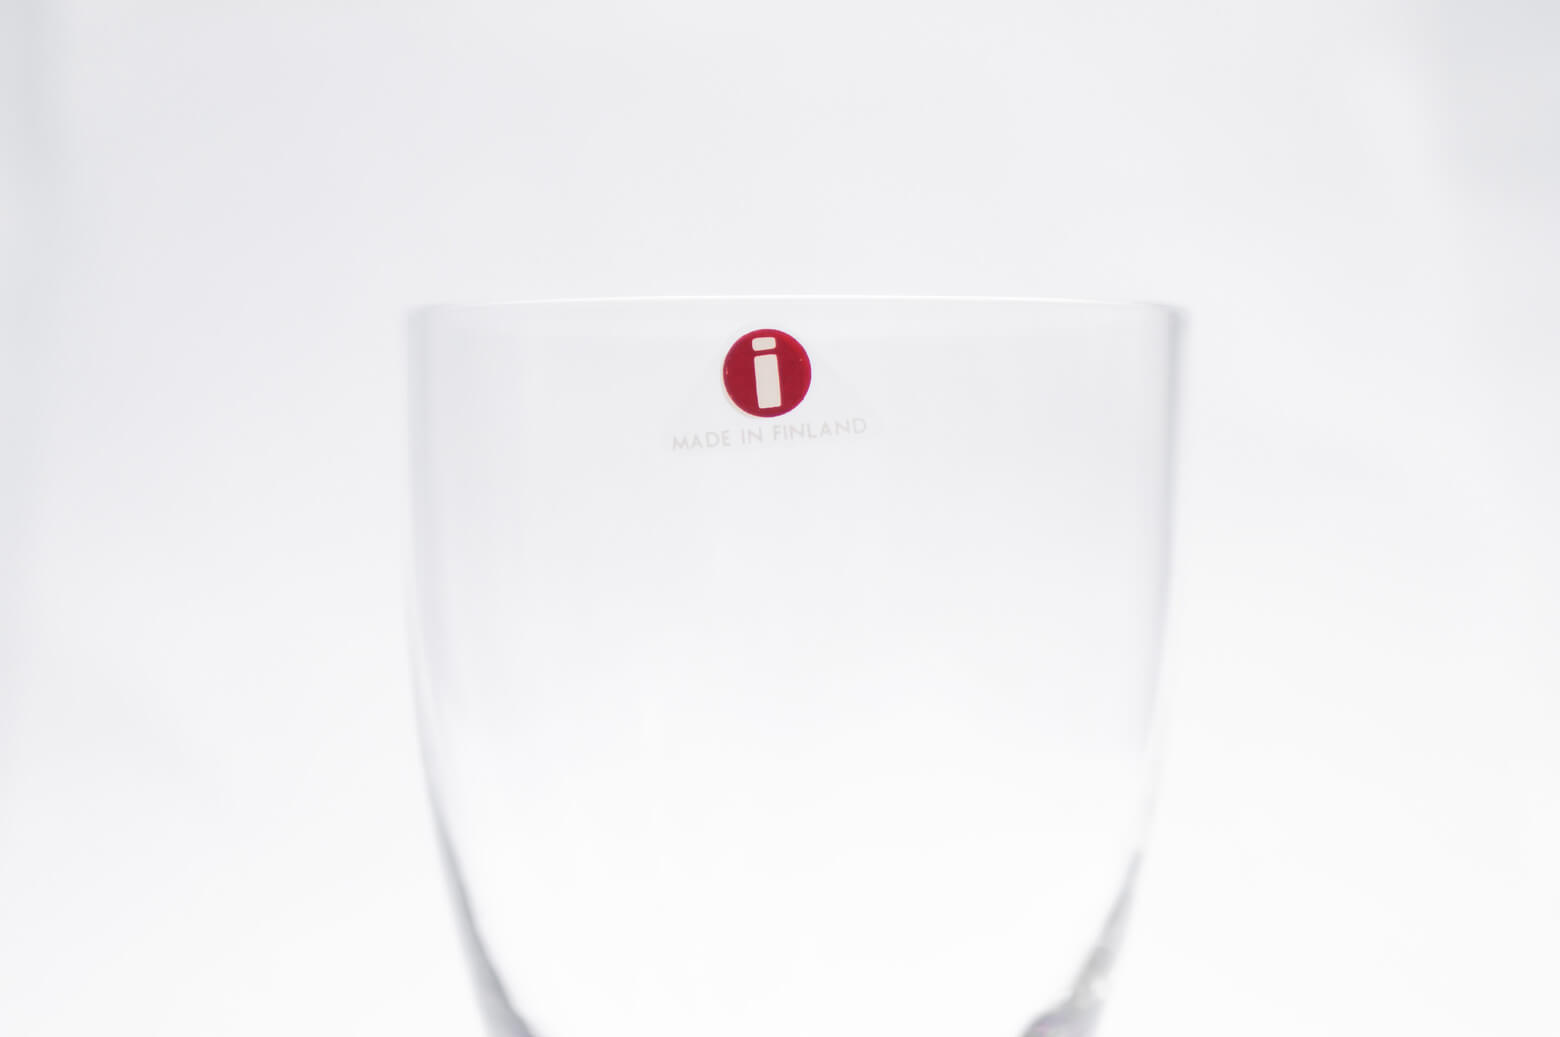 iittala Tapio Wirkkala White Wine Glass /イッタラ タピオ・ヴィルカラ ホワイト ワイン グラス 180ml 北欧食器 フィンランド 1